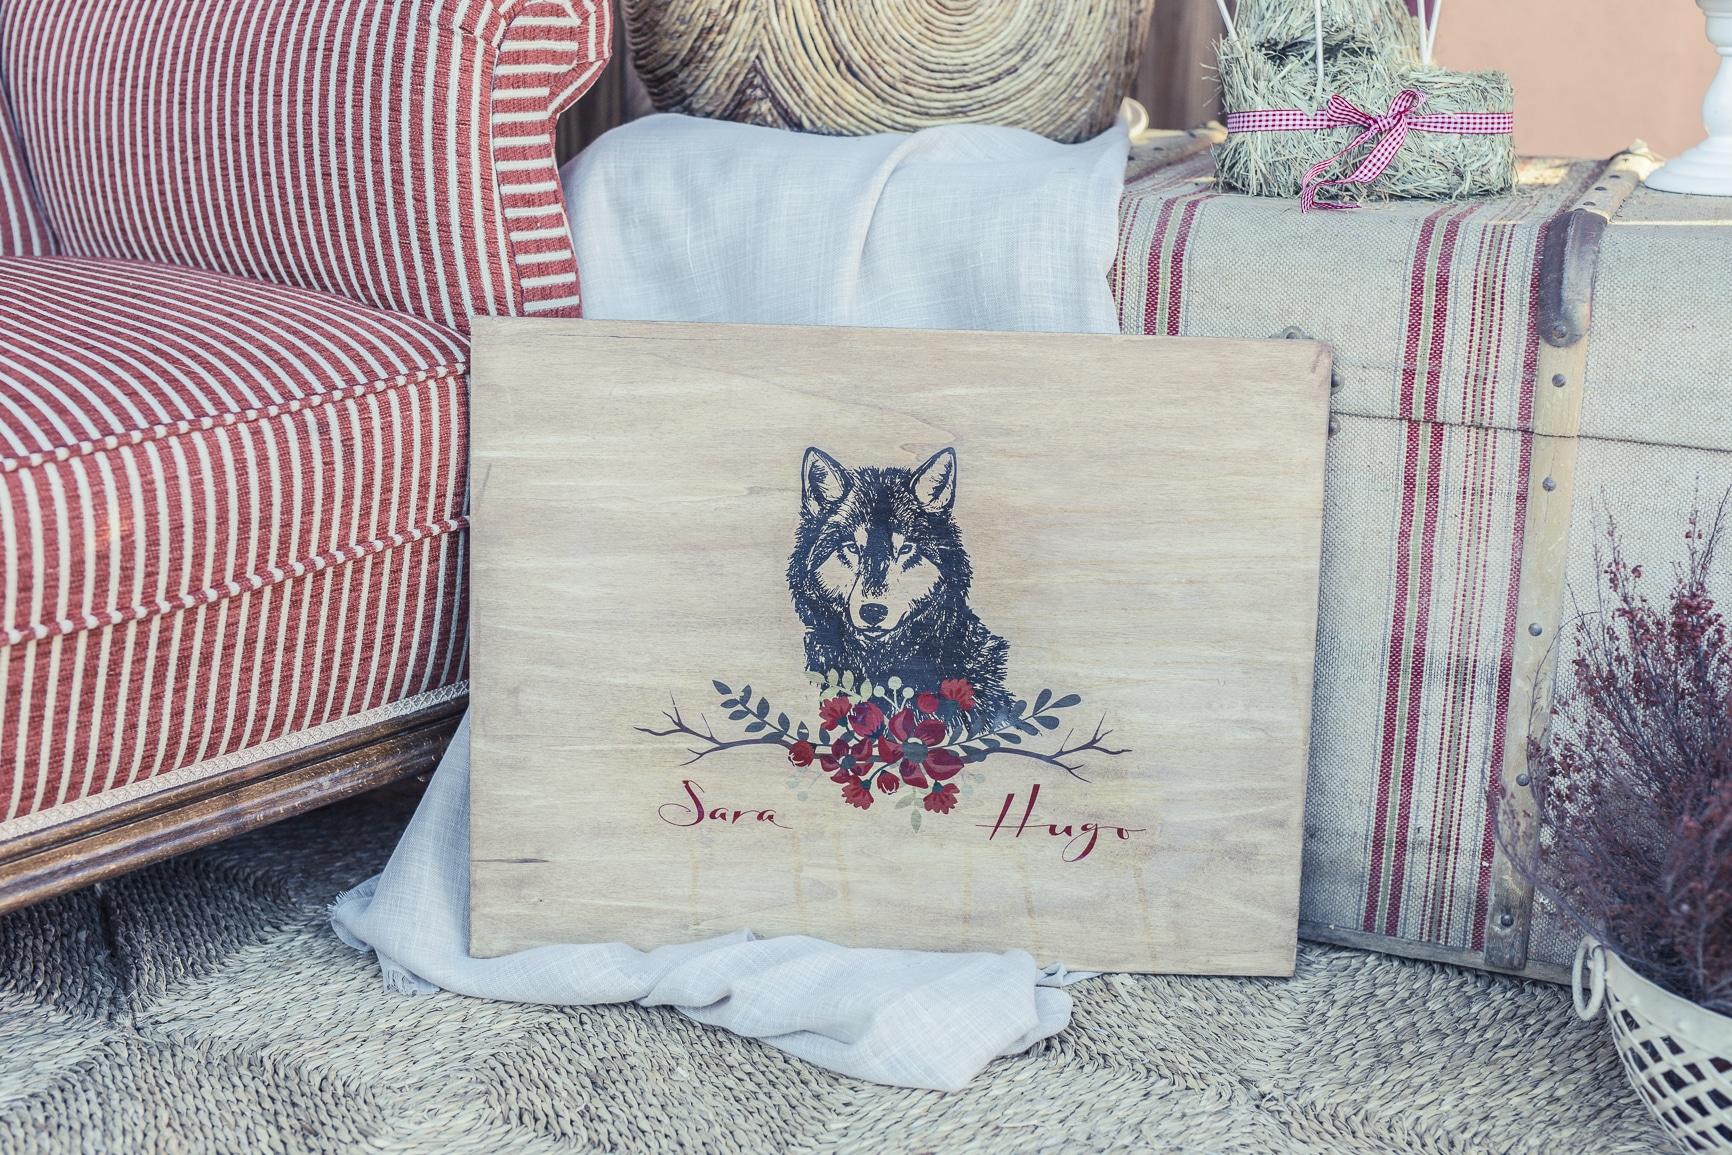 boda de cuento detalle cartel lobo caperucita